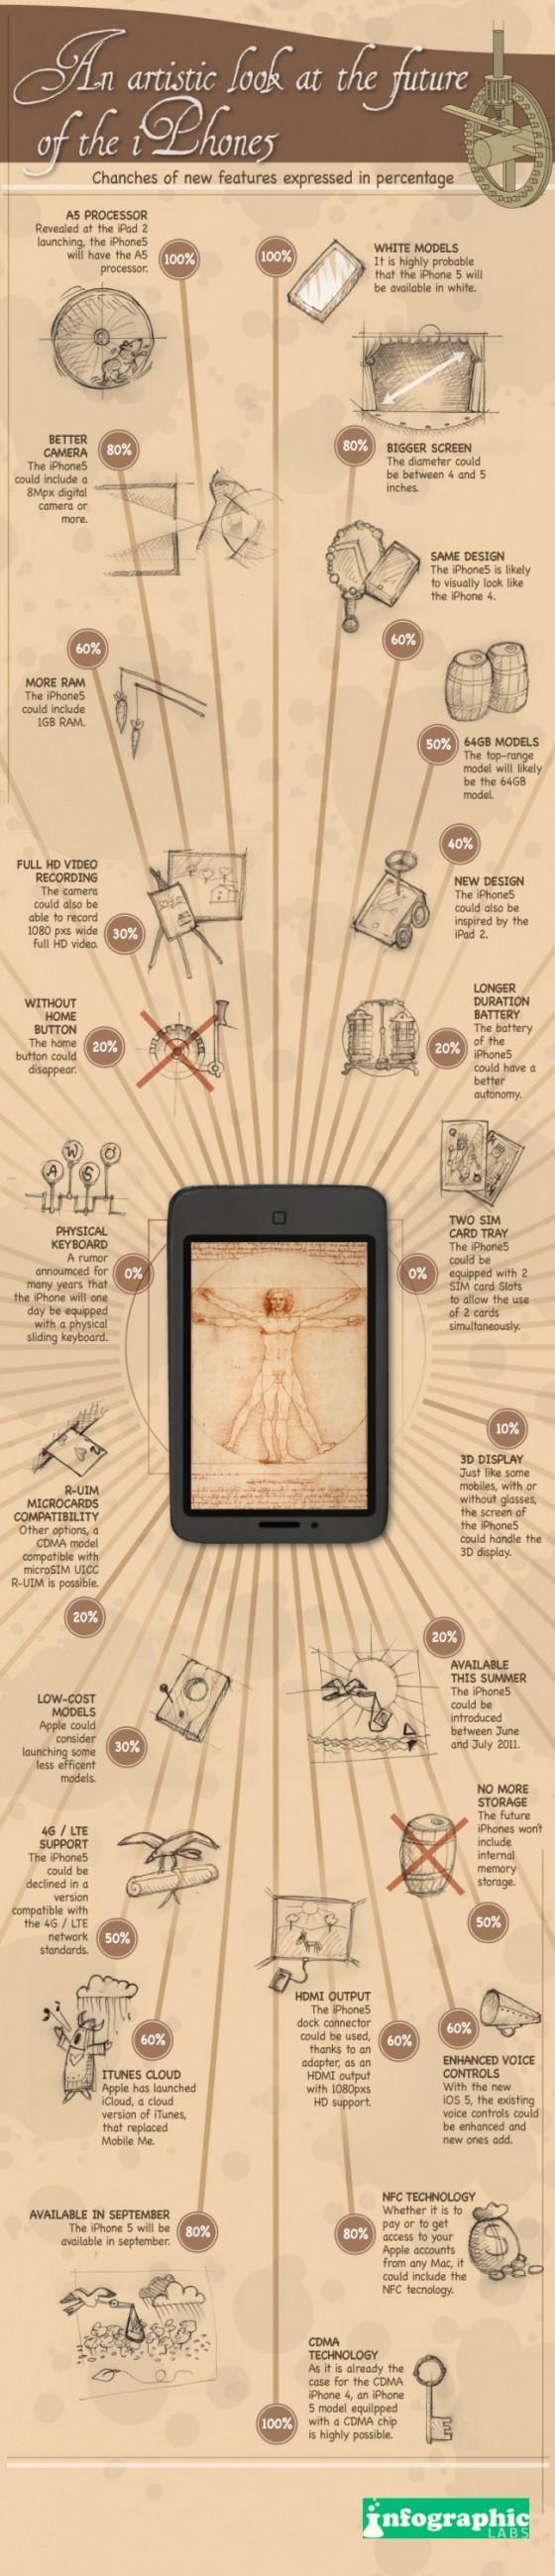 iPhone 5 Infografik Gerüchte